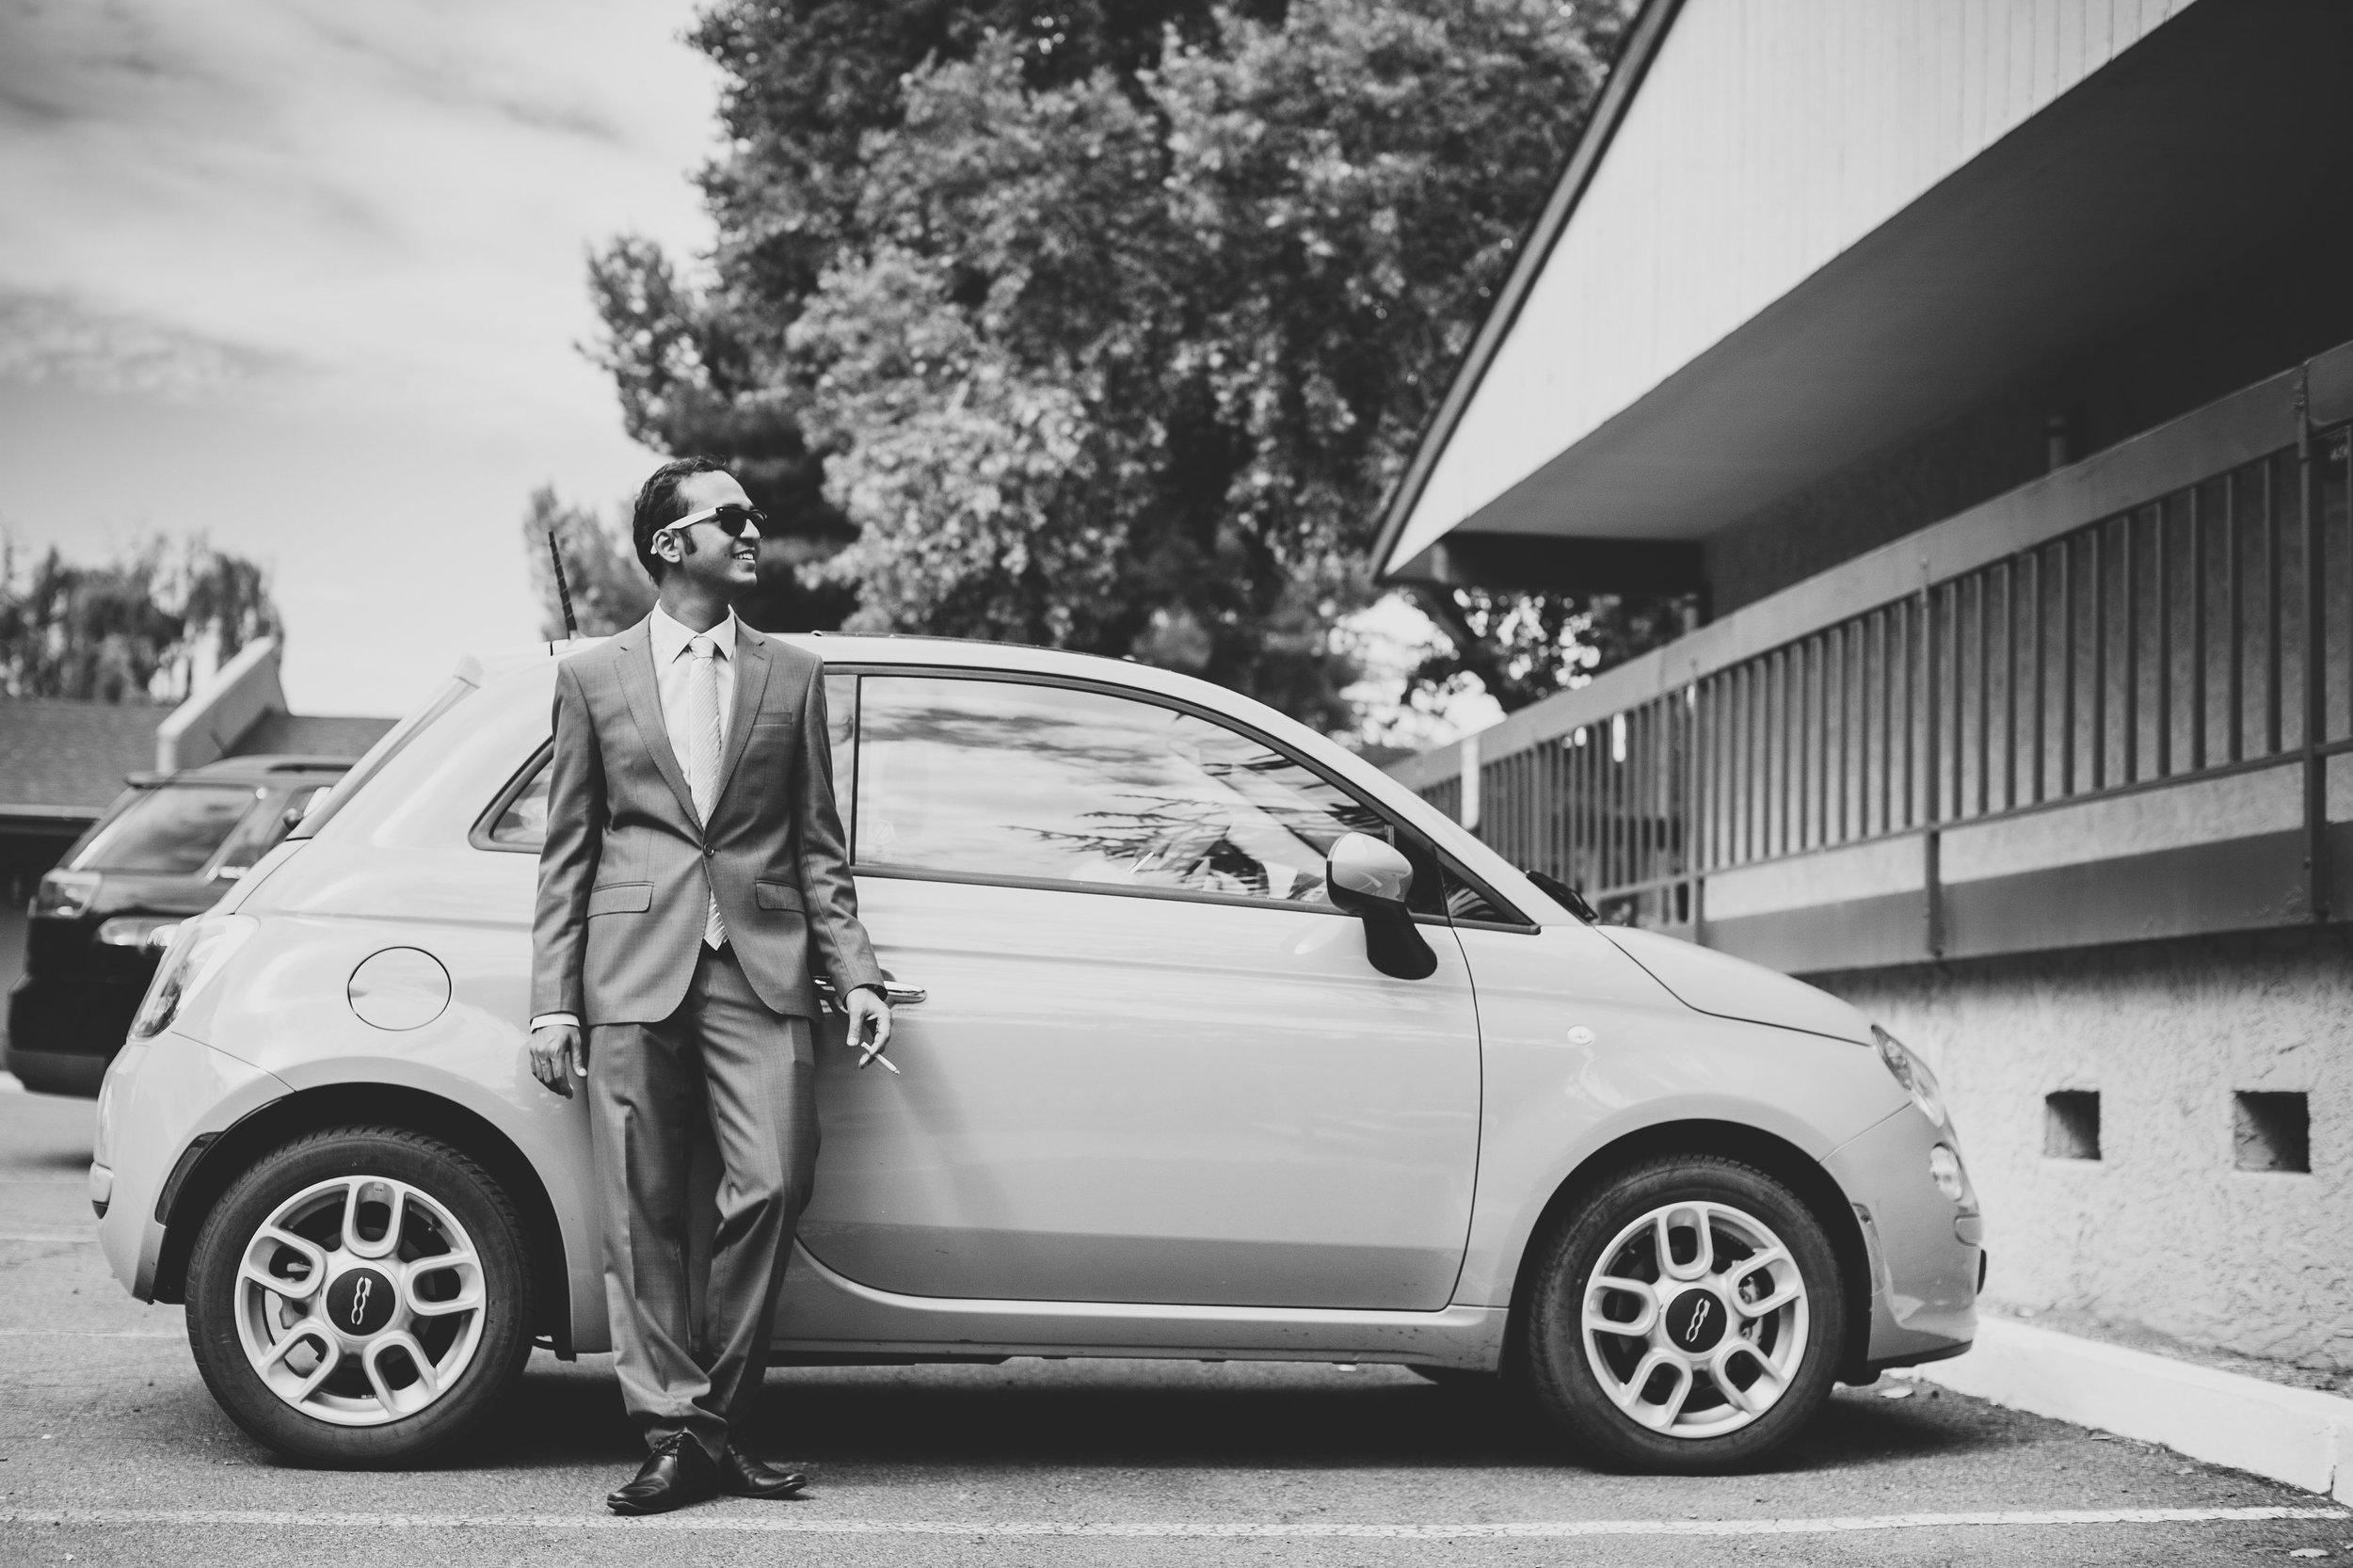 groom-smokes-by-car-bw